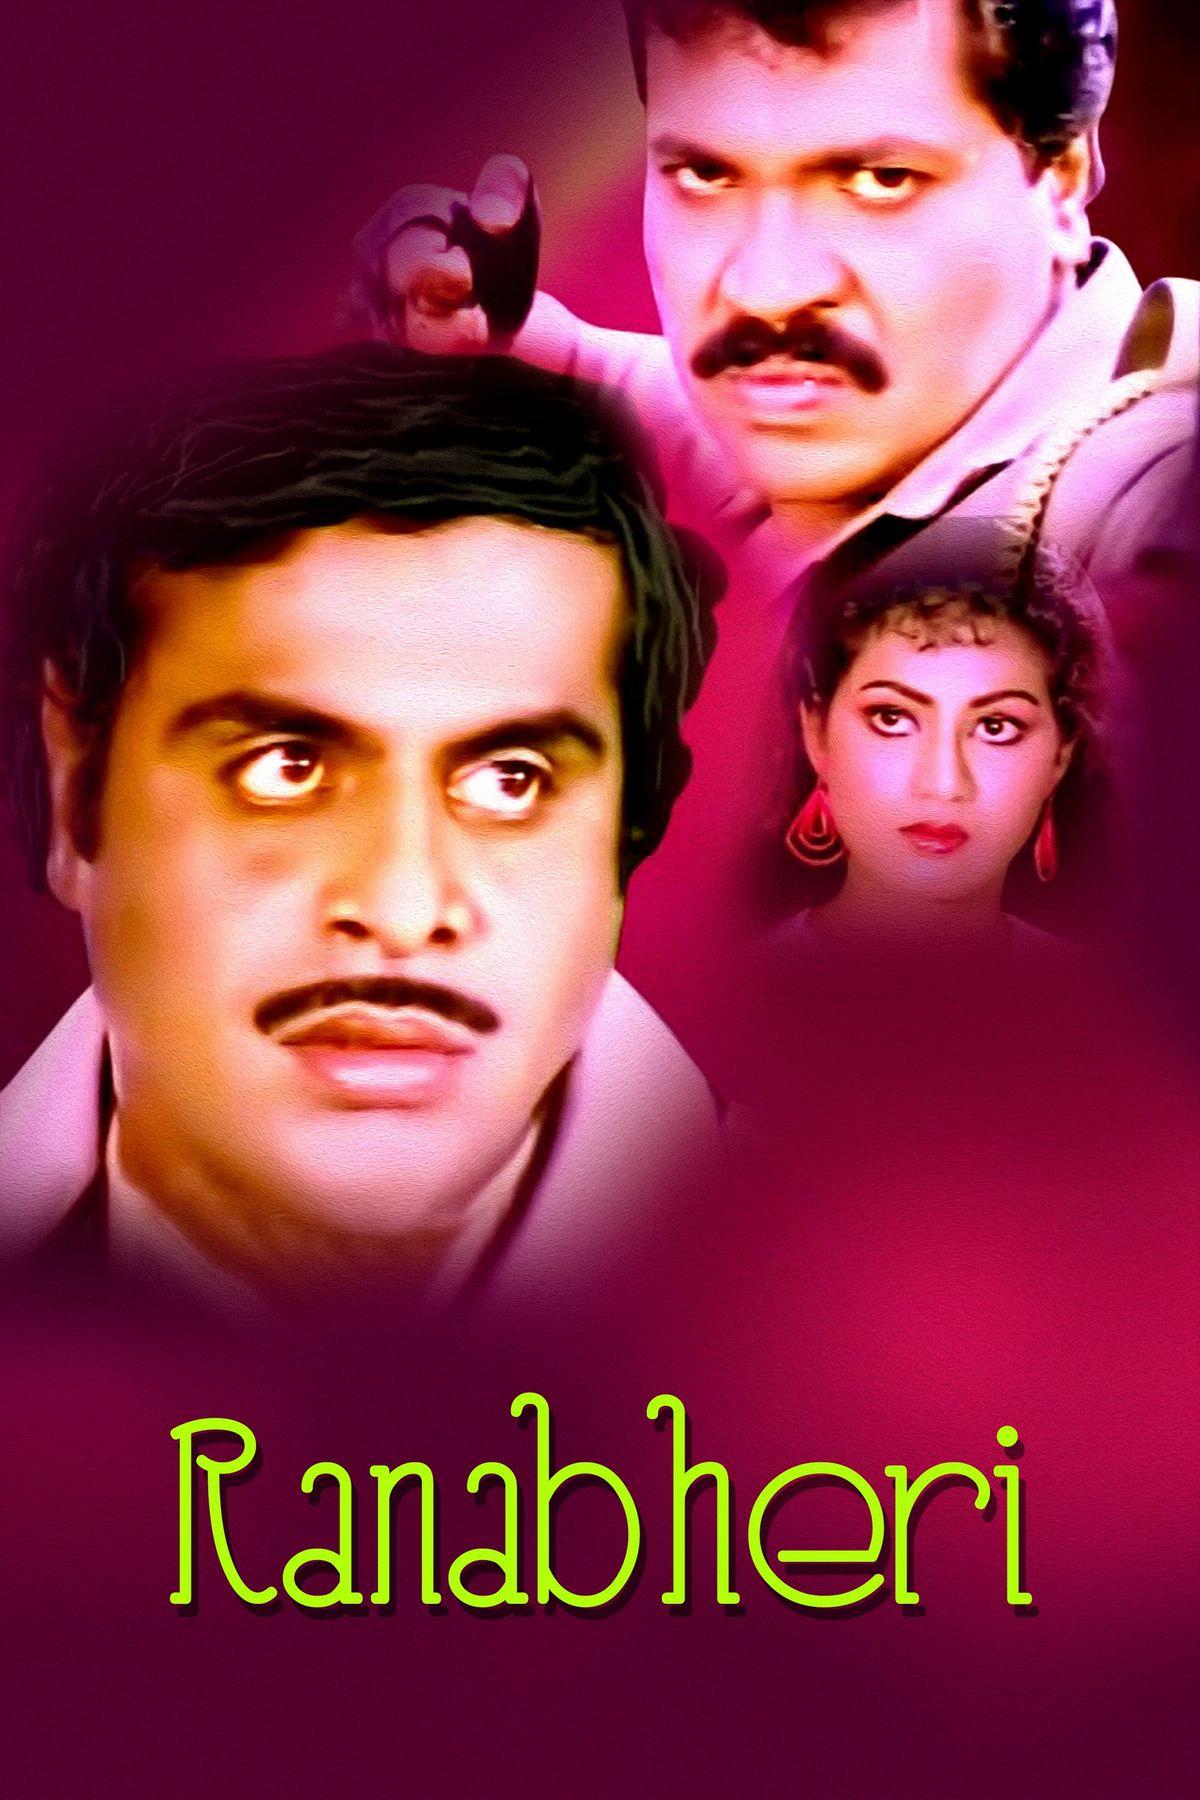 Vani Vishwanath Best Movies, TV Shows and Web Series List